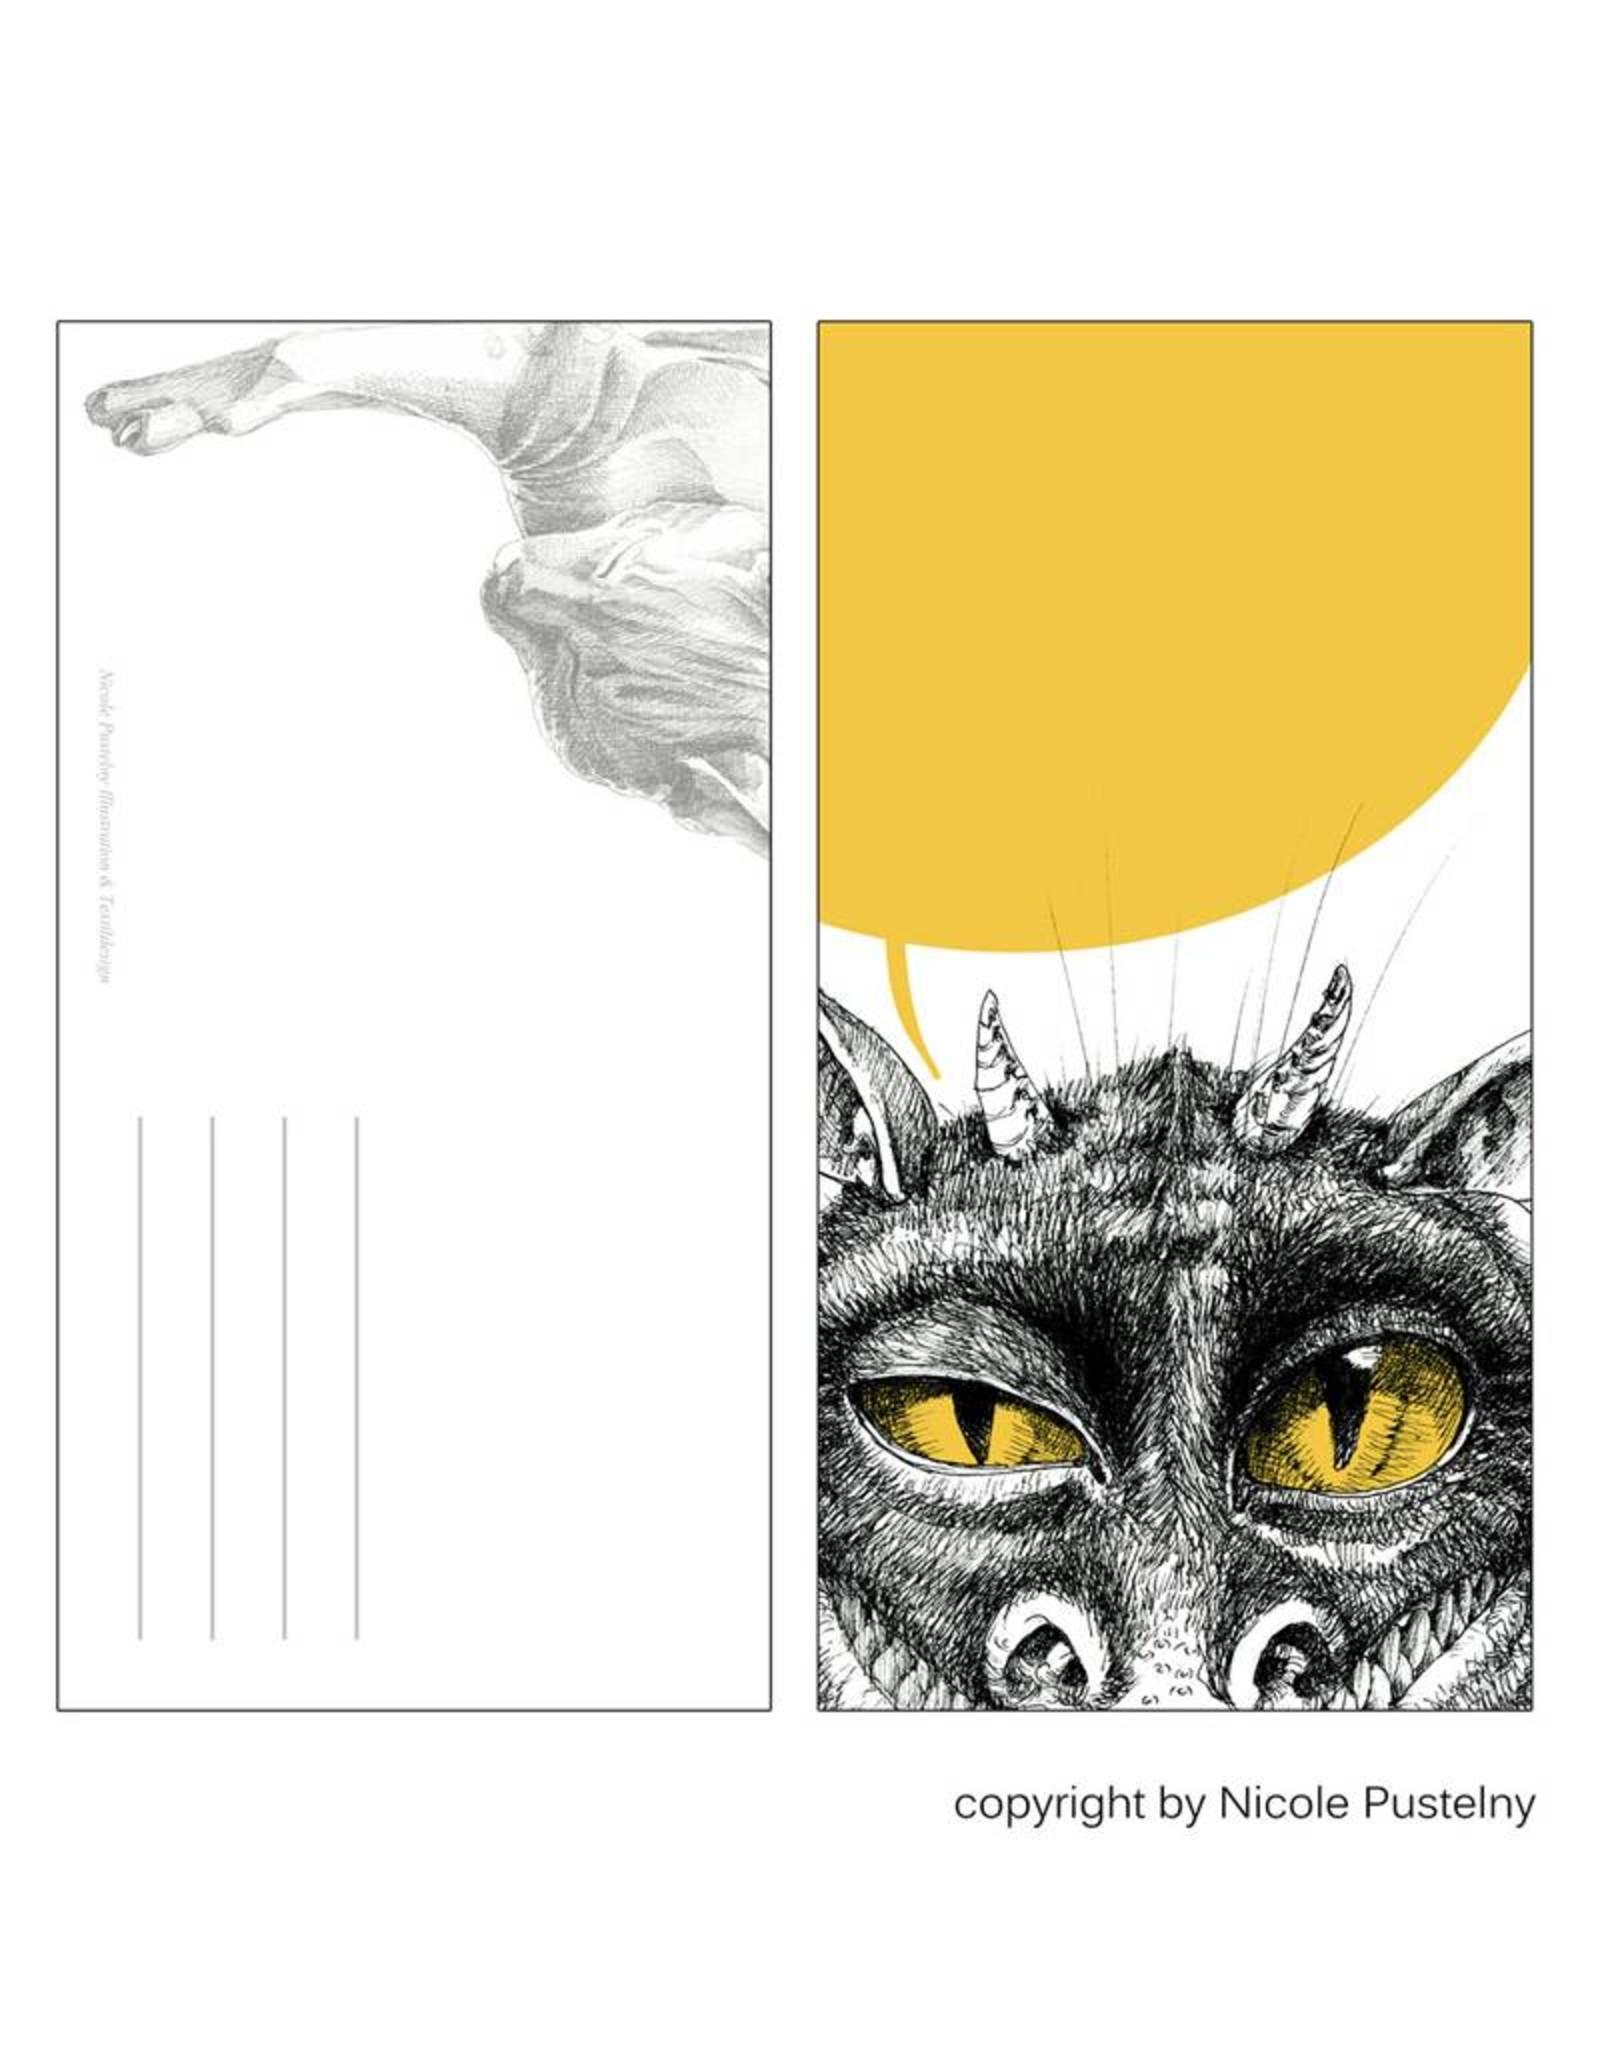 Nicole Pustelny Postkarte - Monsterblick